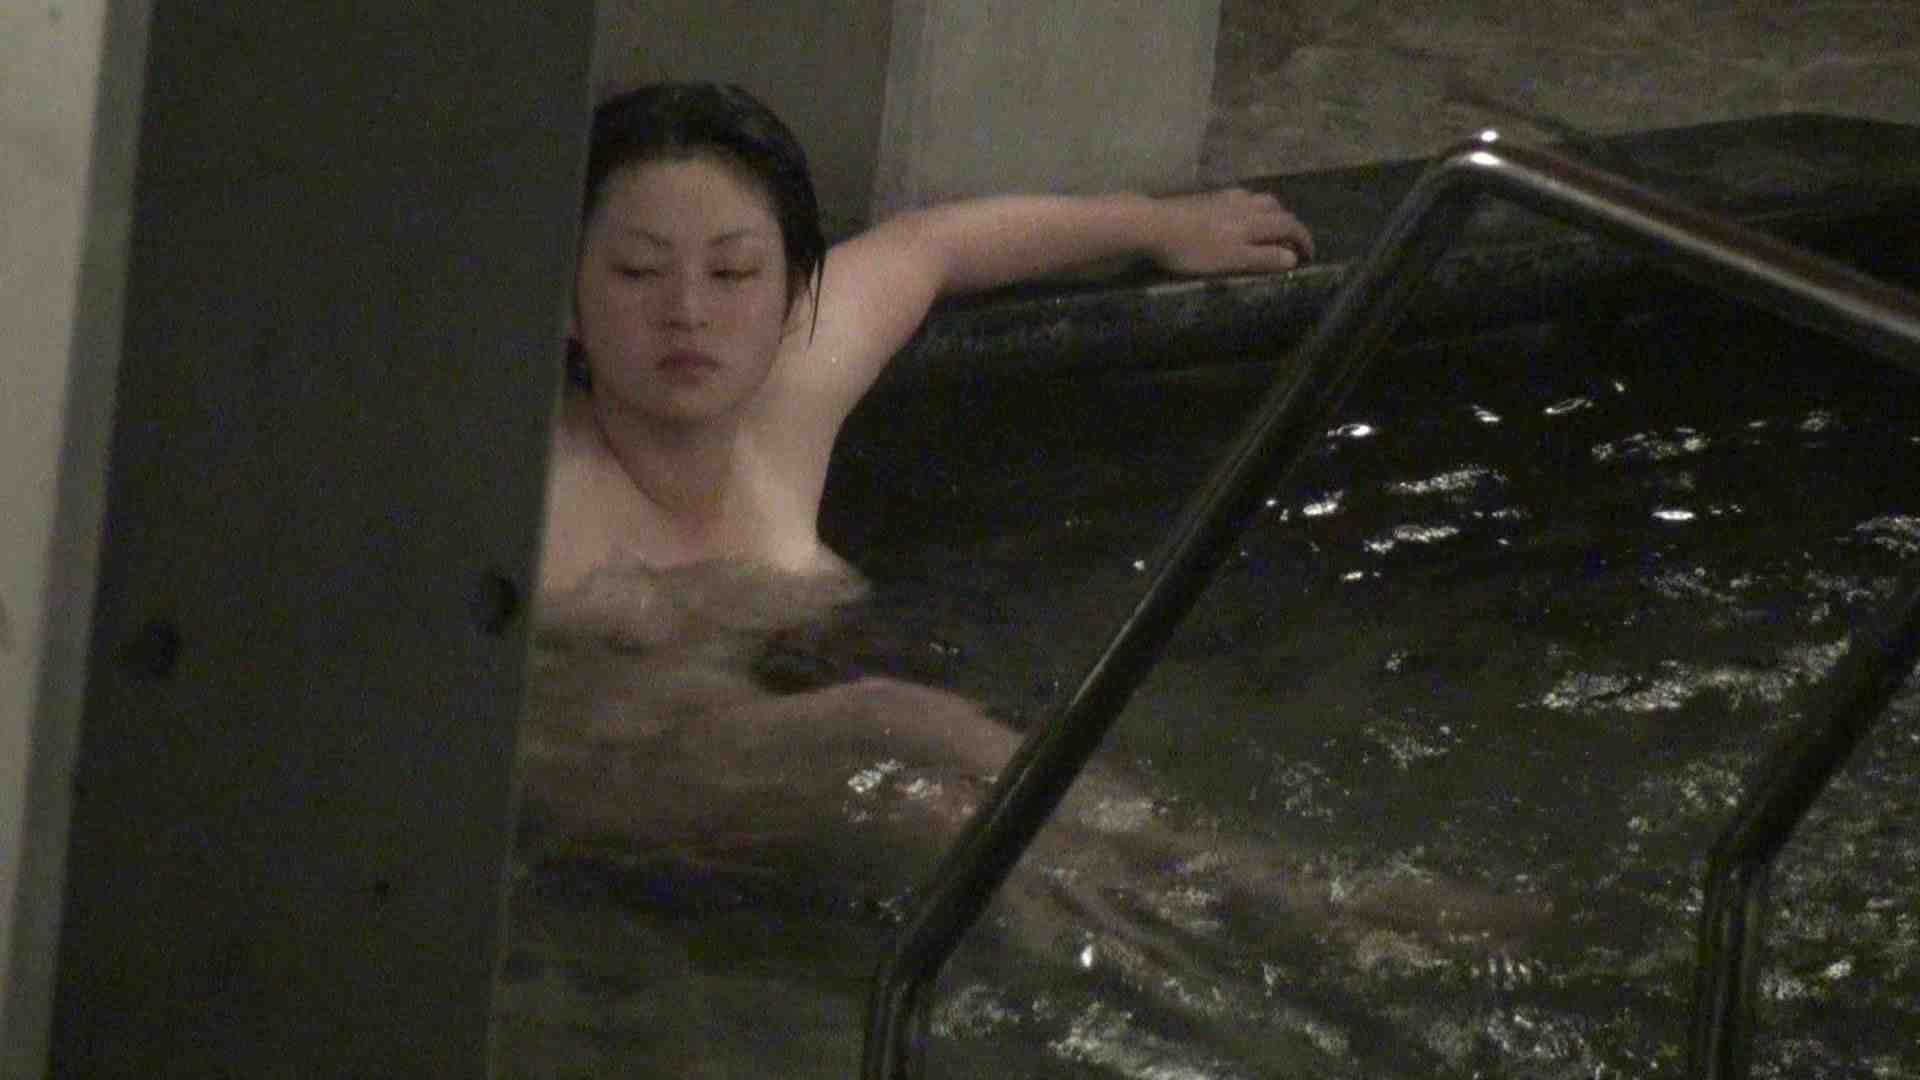 Aquaな露天風呂Vol.338 露天風呂編 | 盗撮シリーズ  82PIX 45